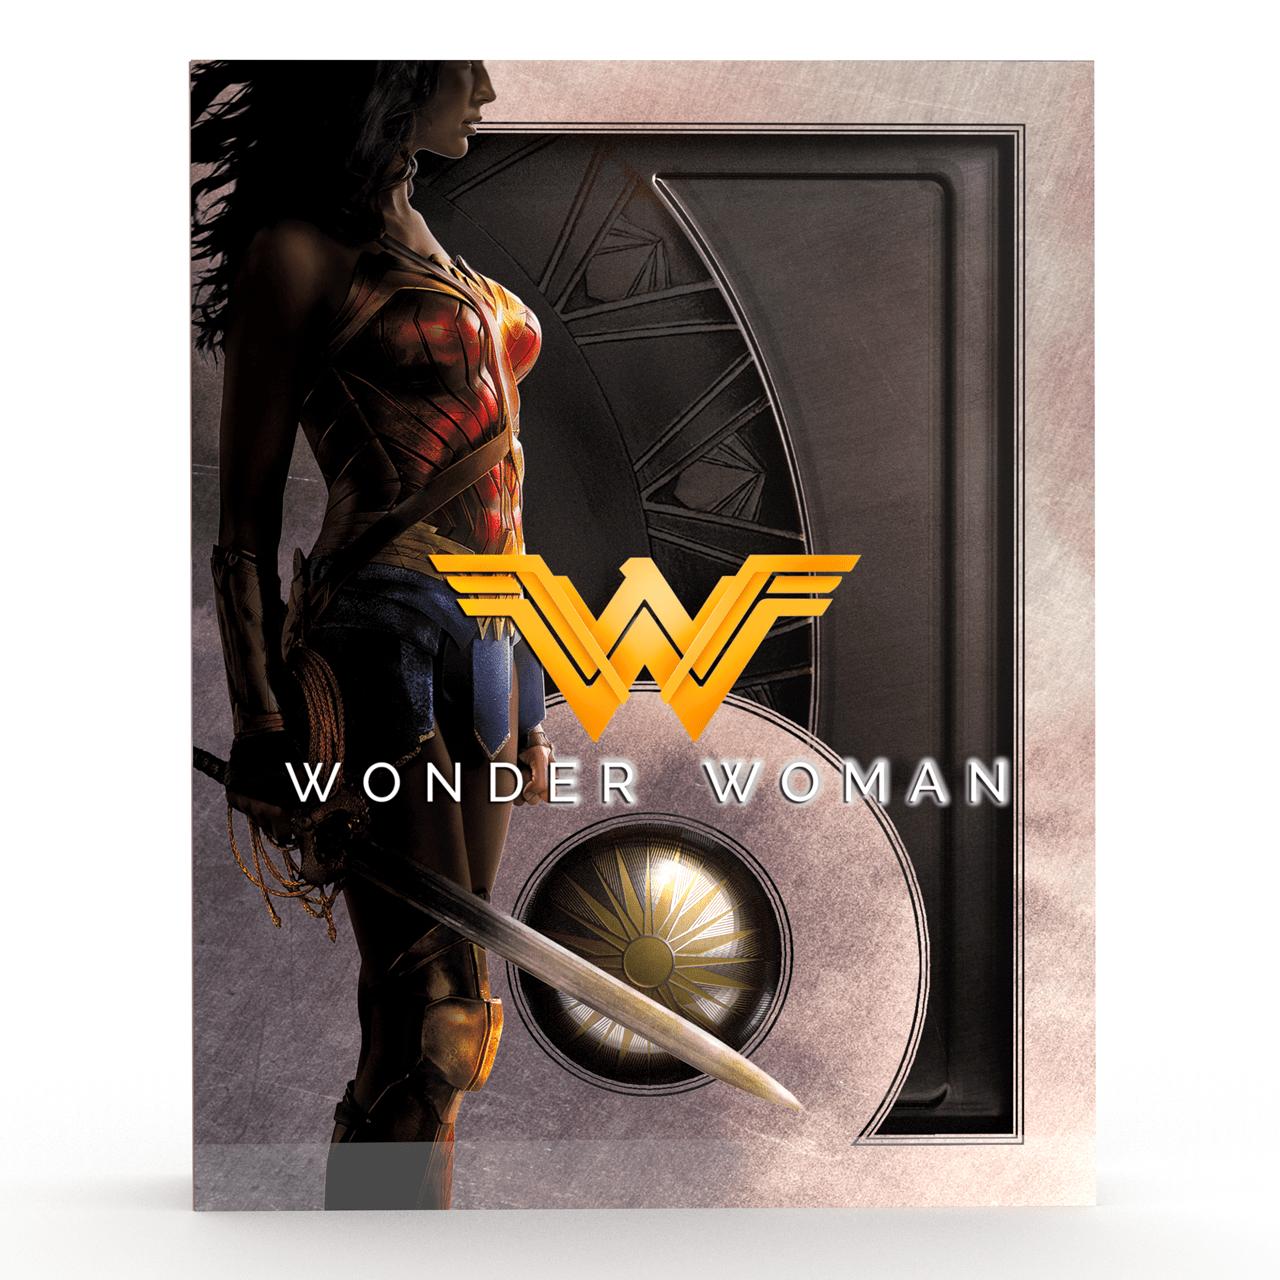 Wonder Woman Titans of Cult Limited Edition 4K Steelbook - 1